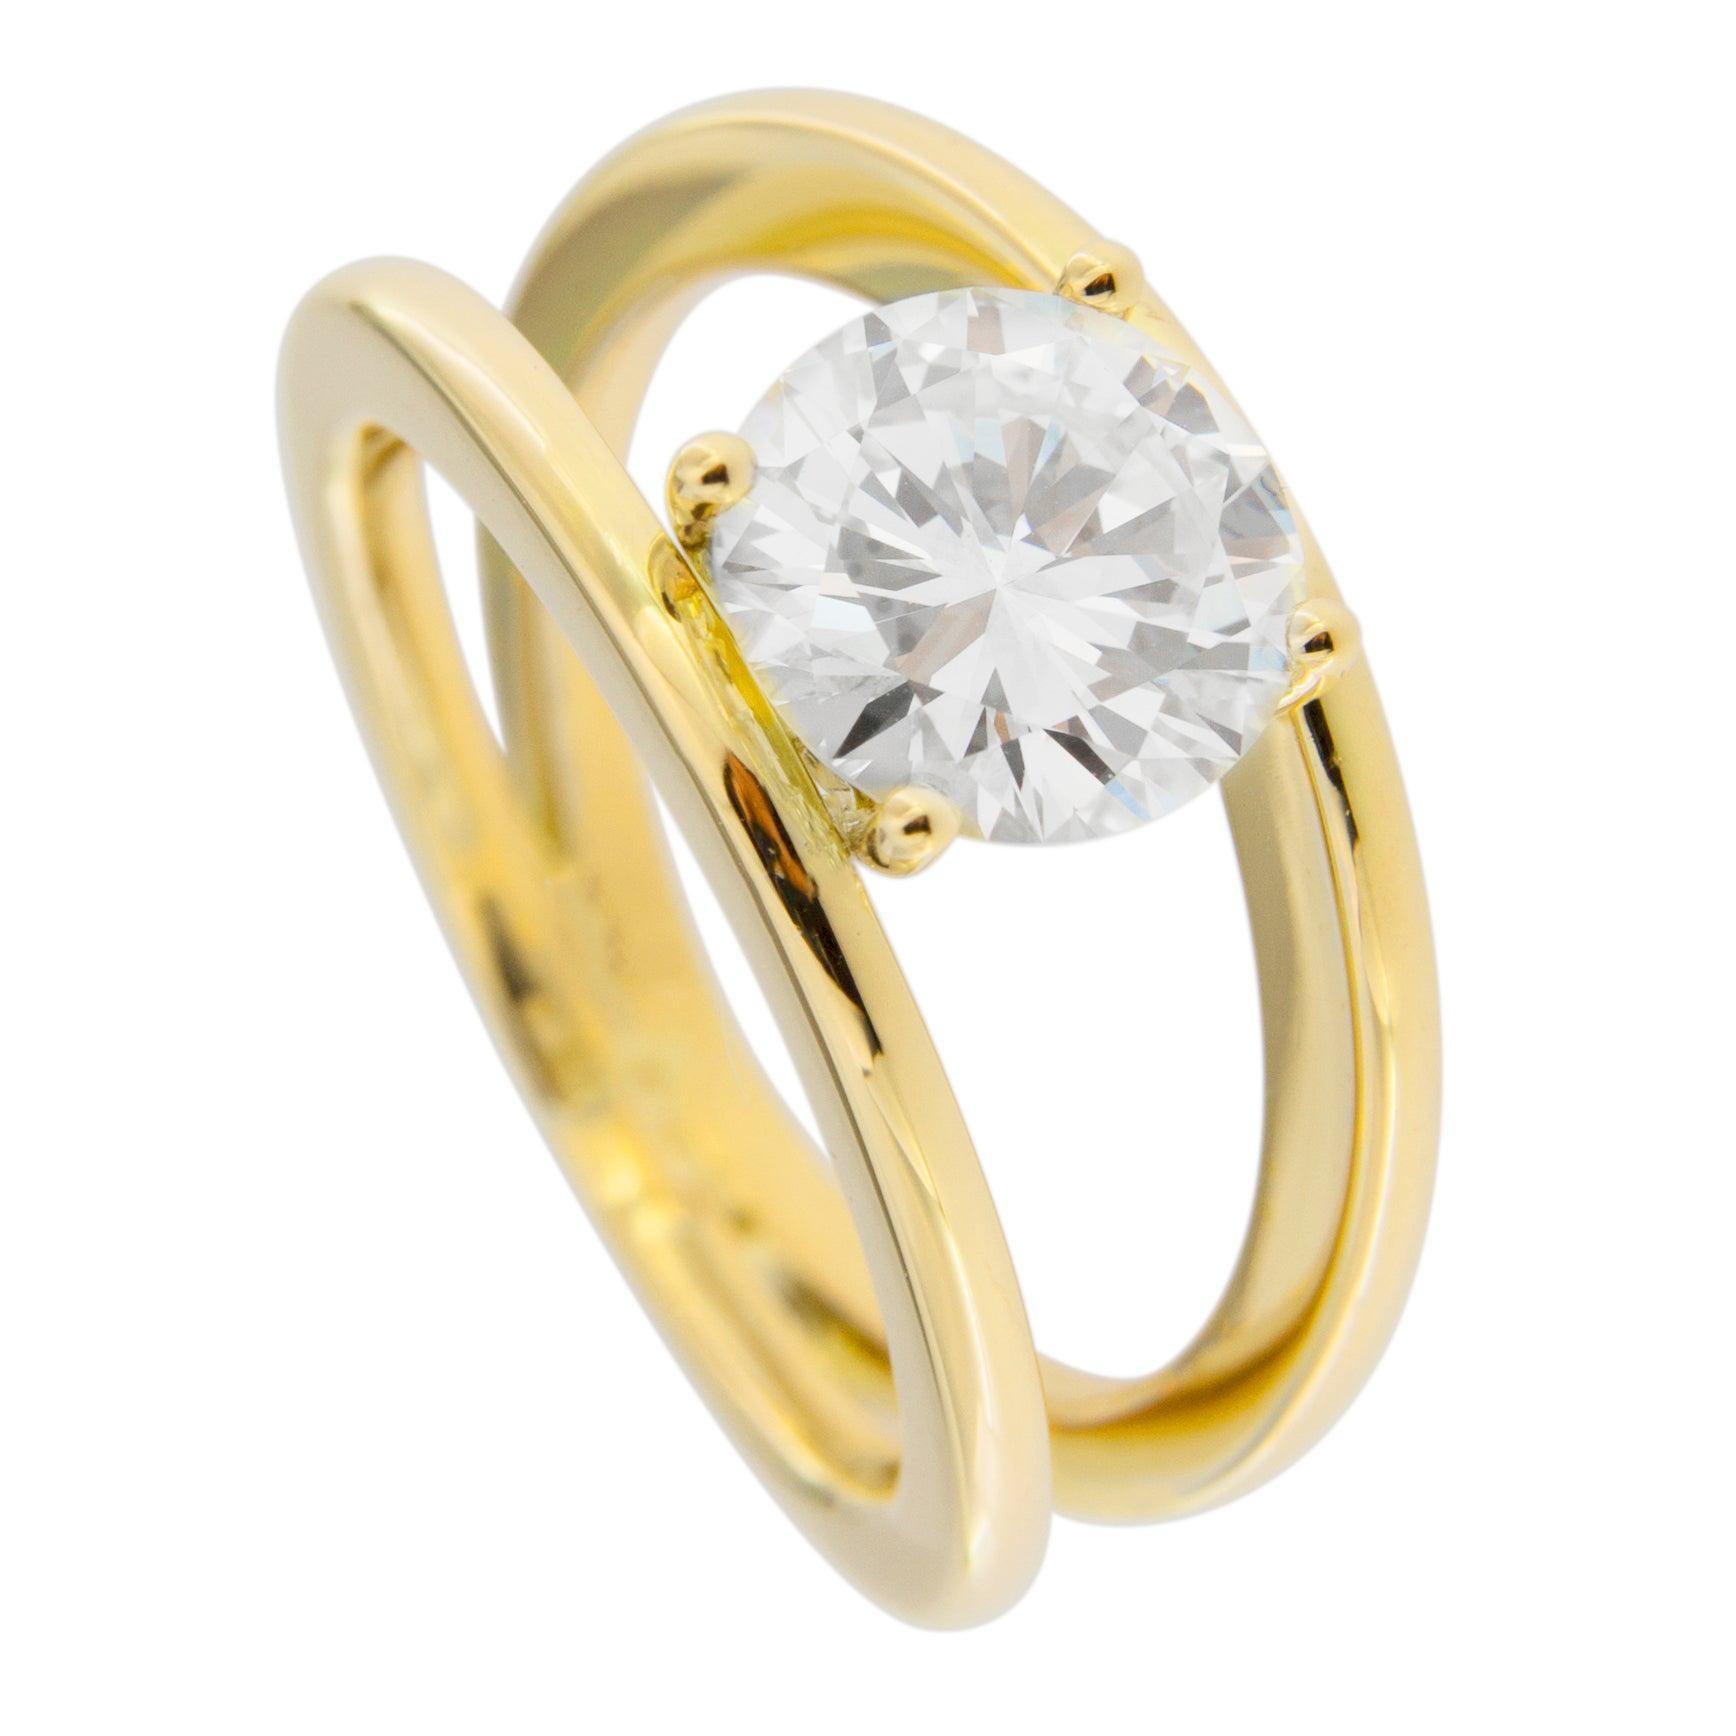 Alex Jona 2.52 Carat White Diamond Certified 18 Karat Yellow Gold Solitaire Ring